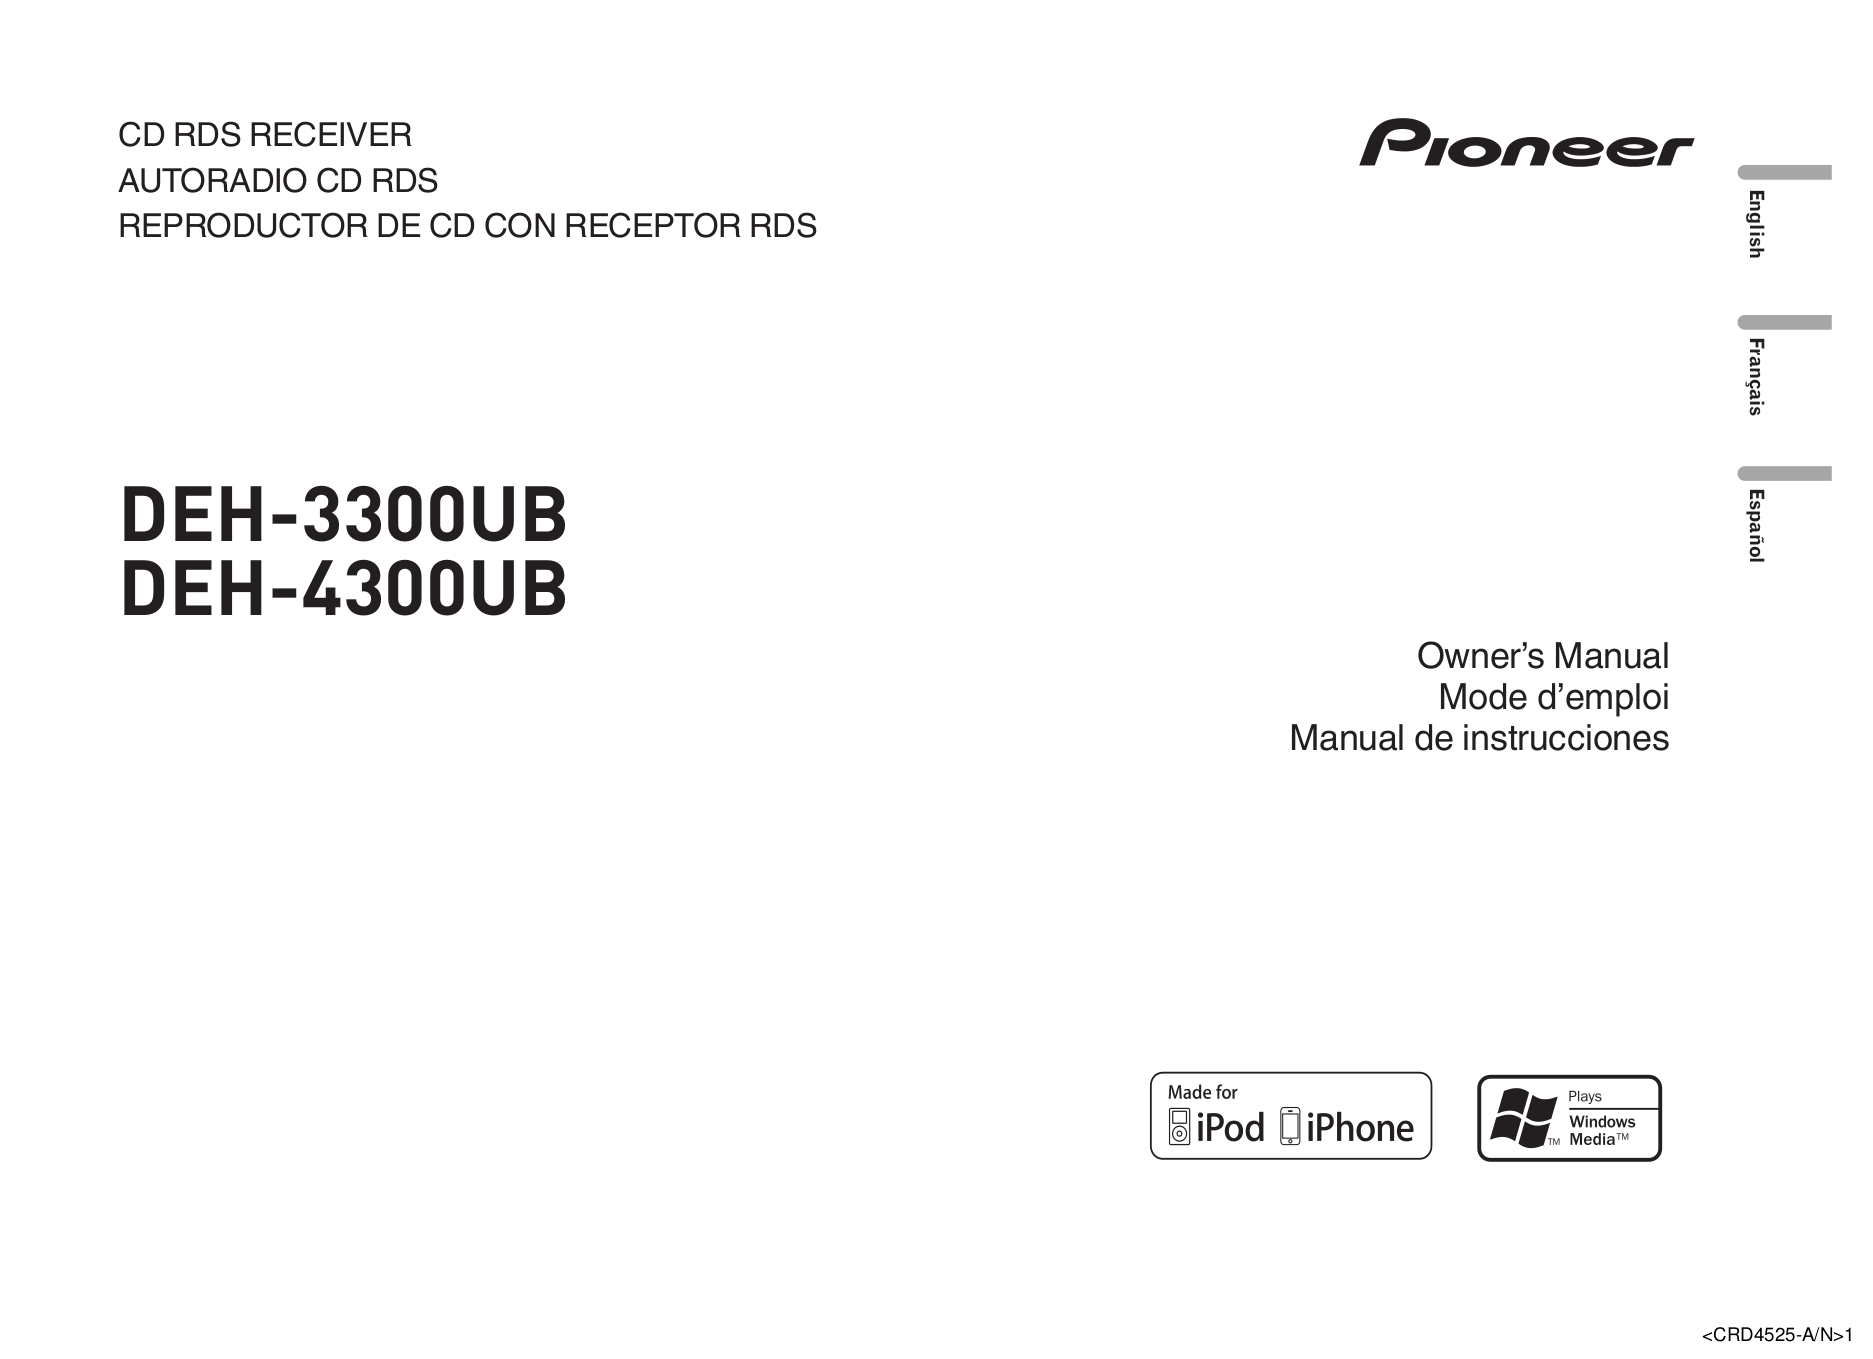 download free pdf for pioneer deh 3300ub car receiver manual rh umlib com Pioneer DEH-3300UB Manual Pioneer Deh 3300